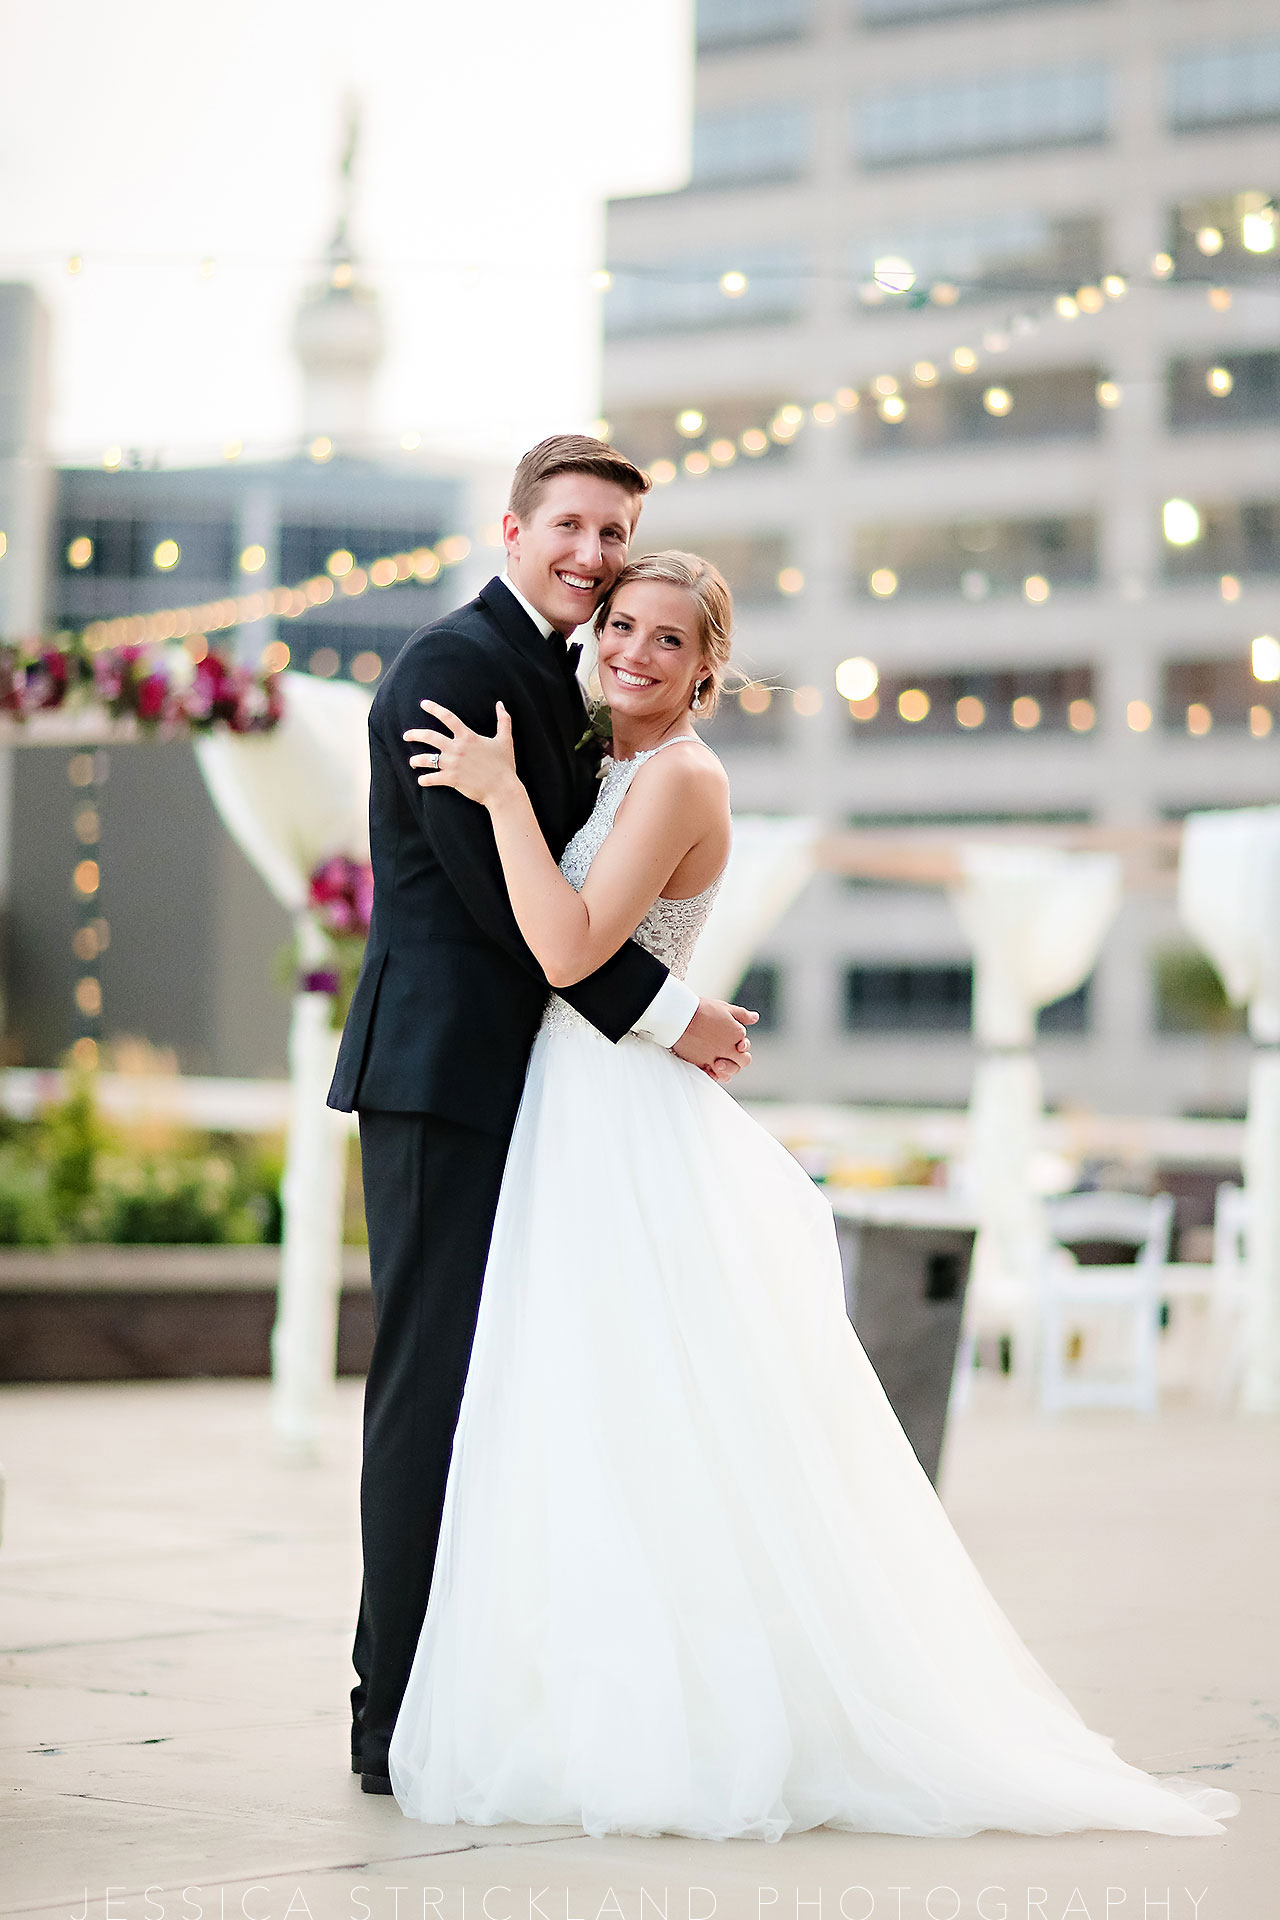 Serra Alex Regions Tower Indianapolis Wedding 325 watermarked